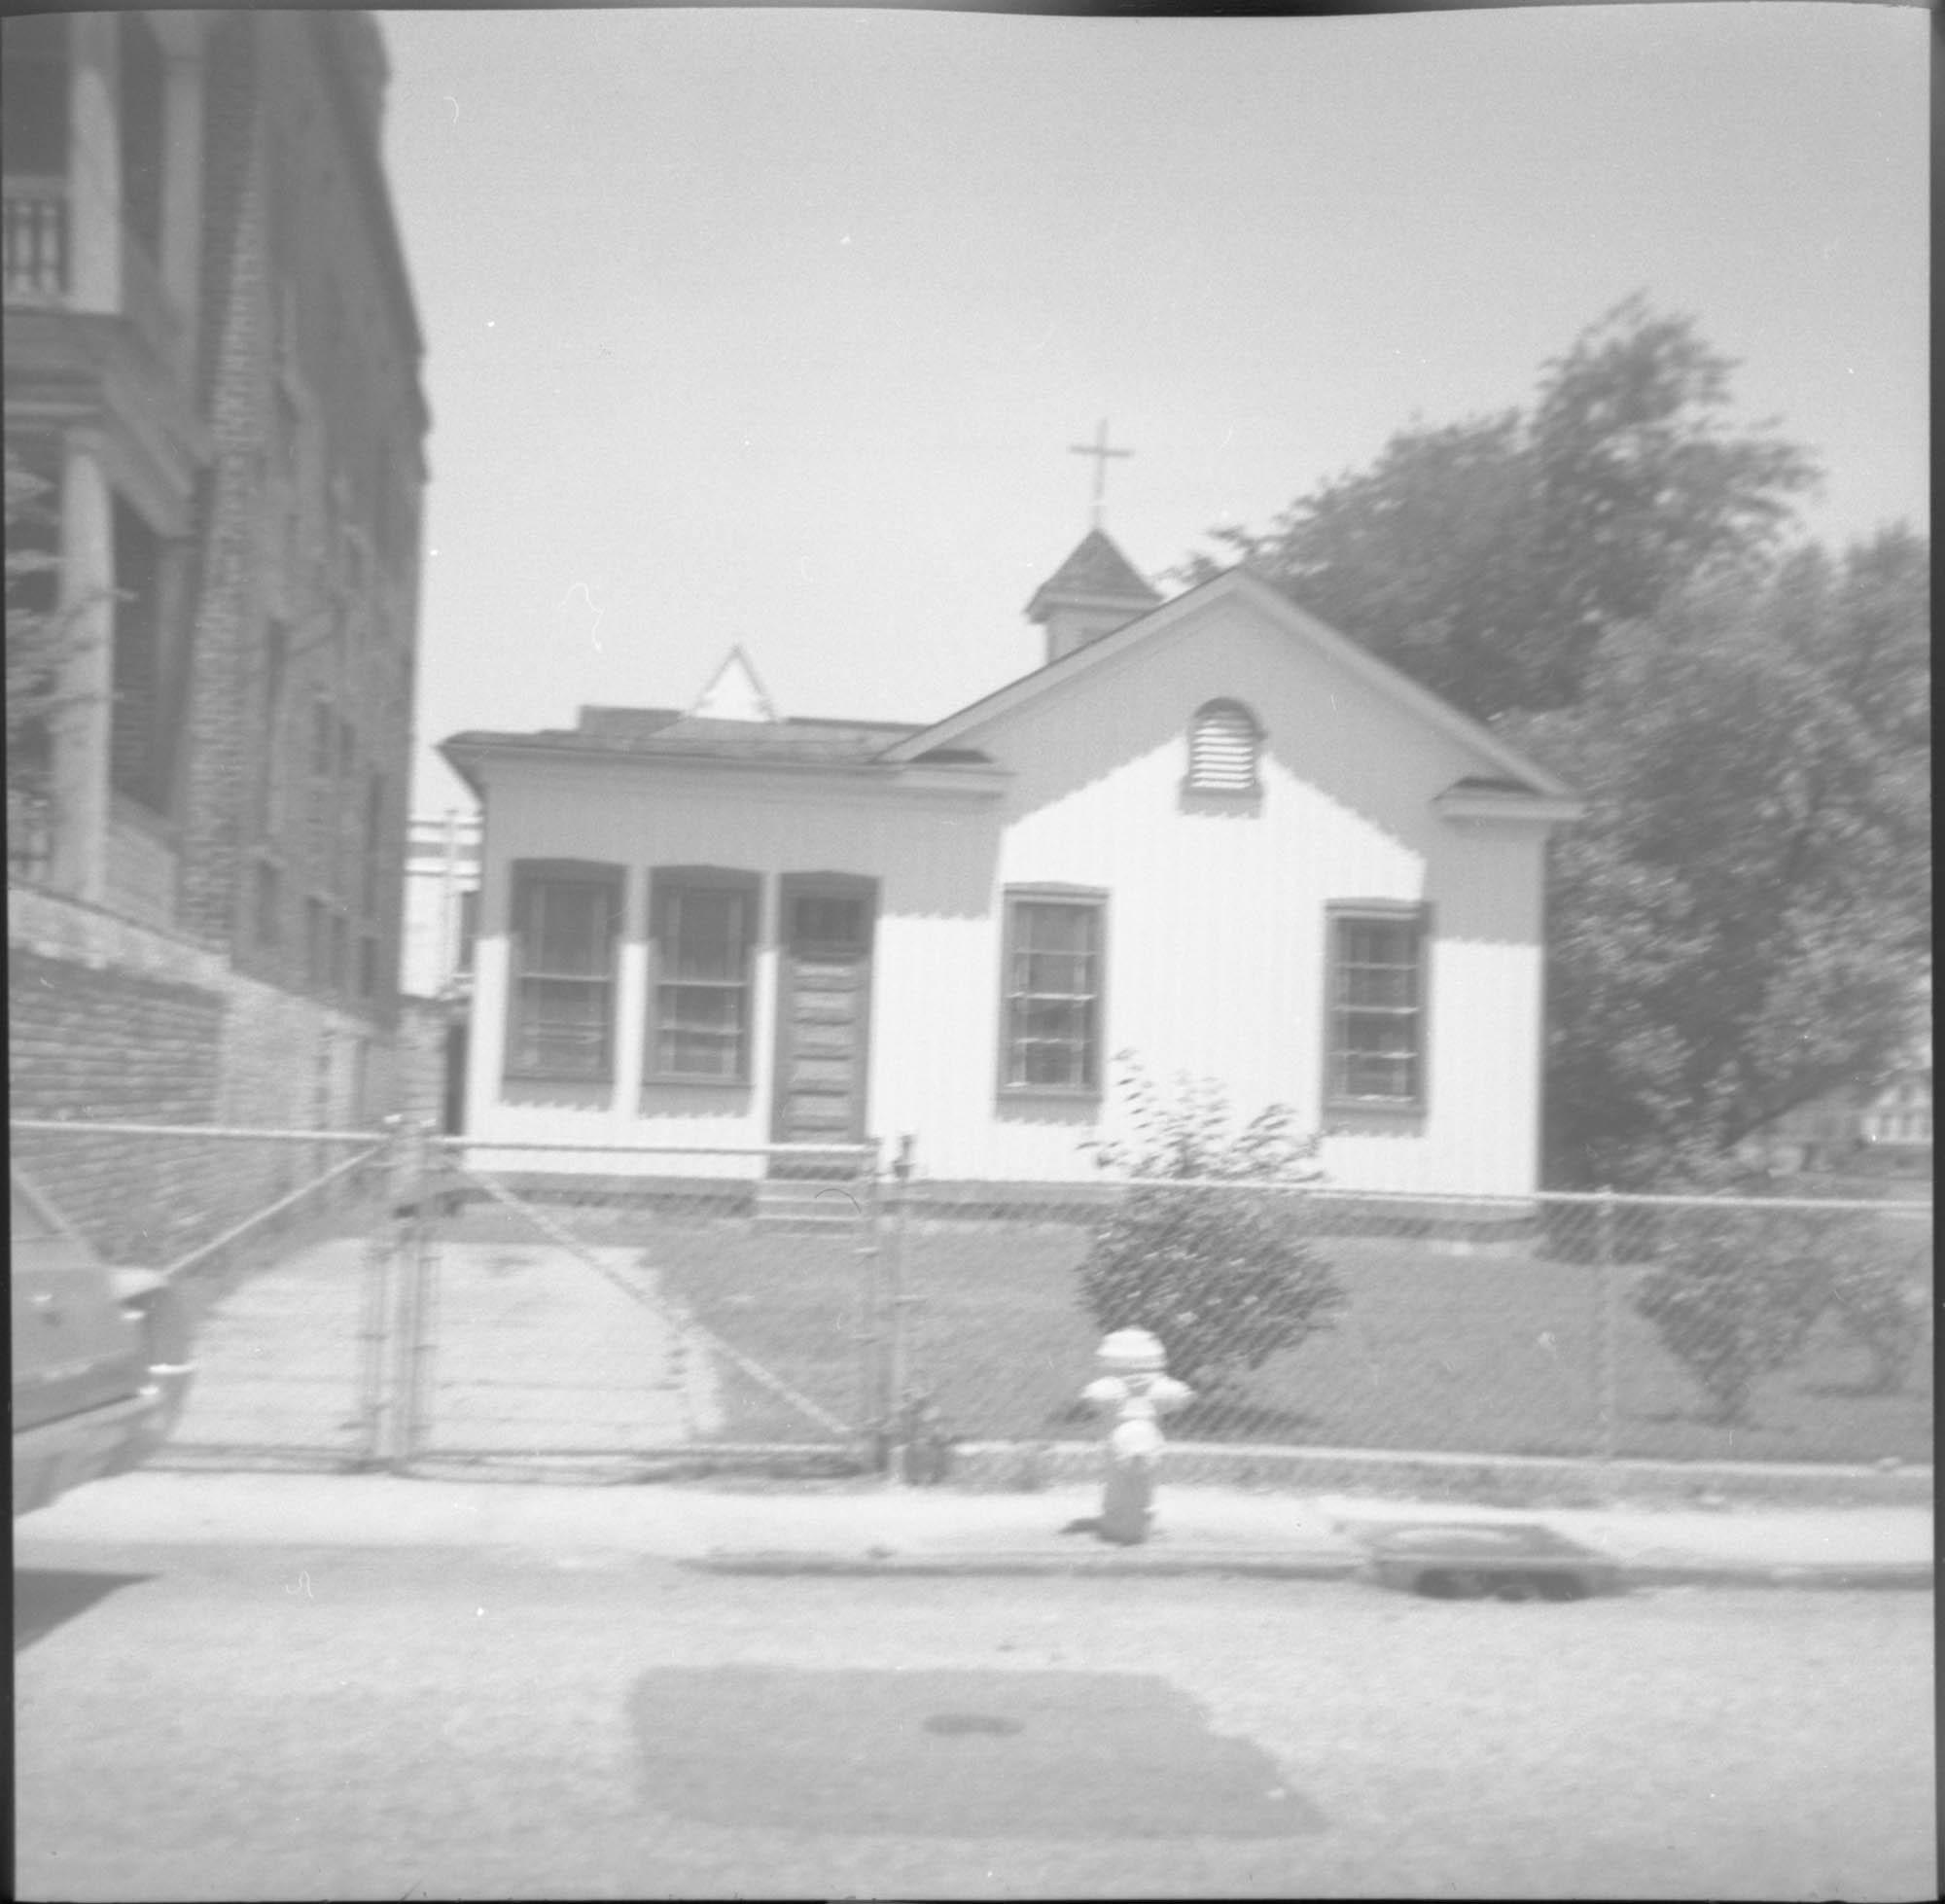 91 Anson Street